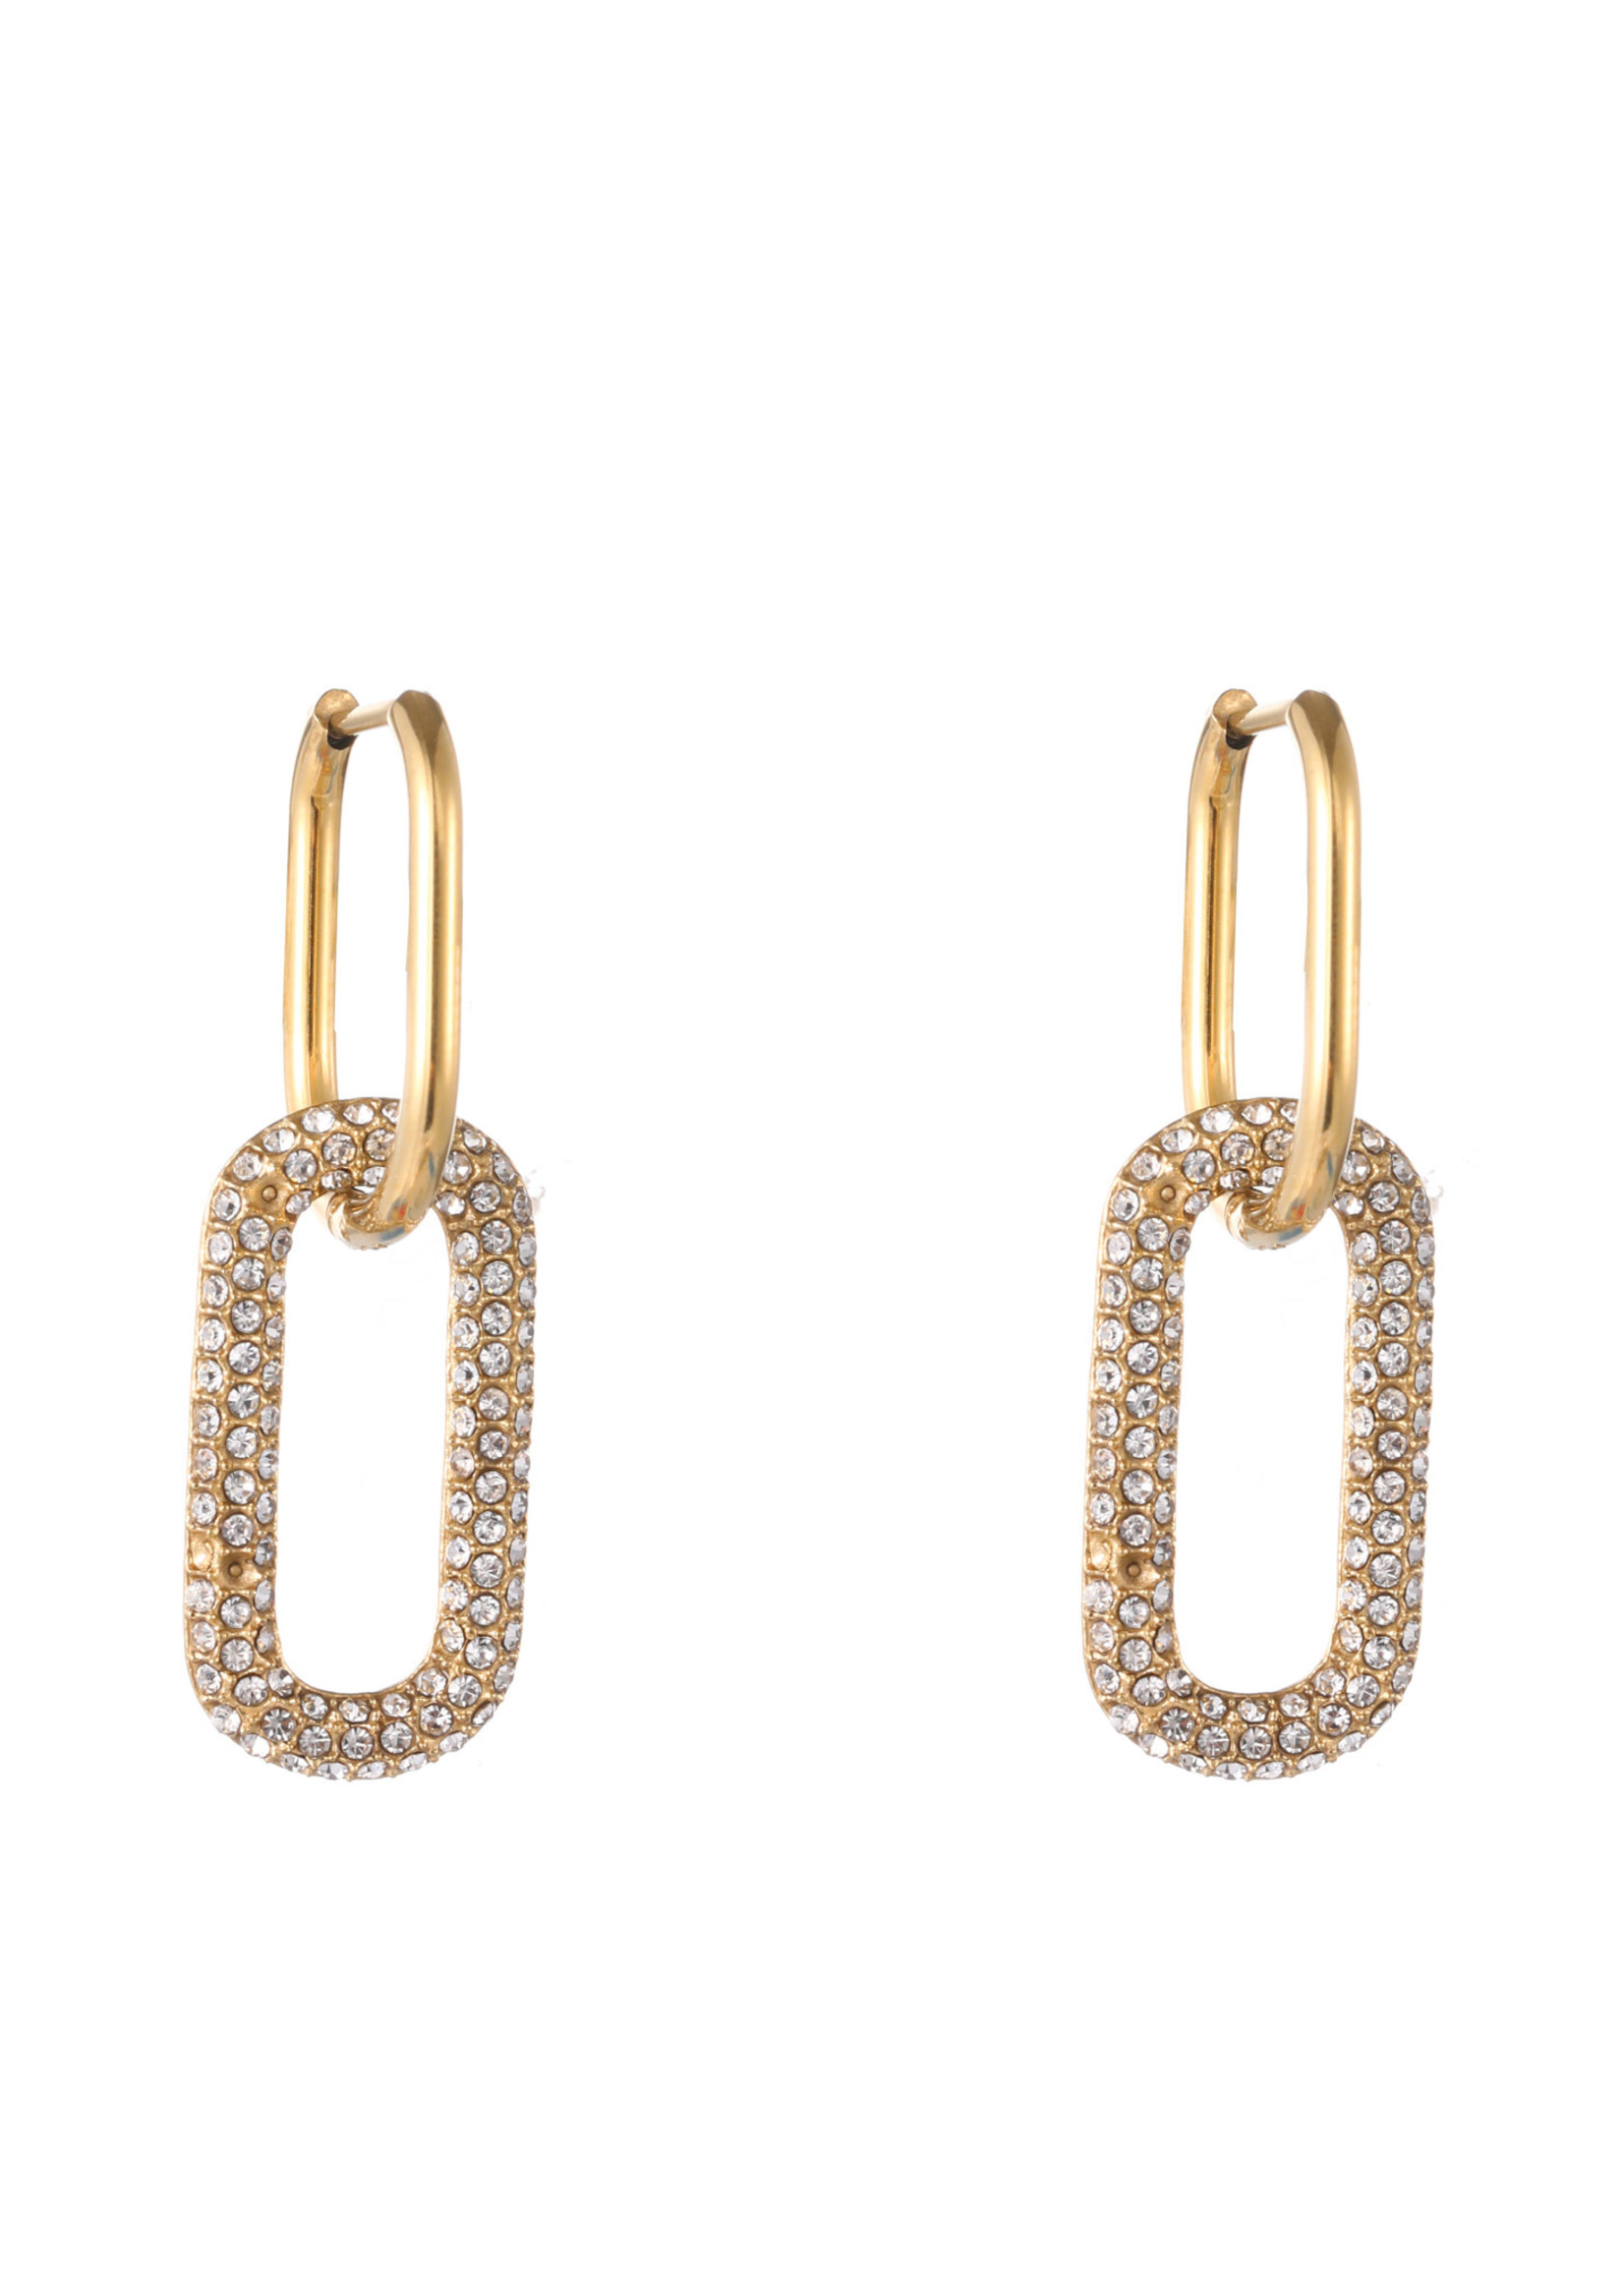 Oorbel goud hanger met crystal steentjes E1796-1